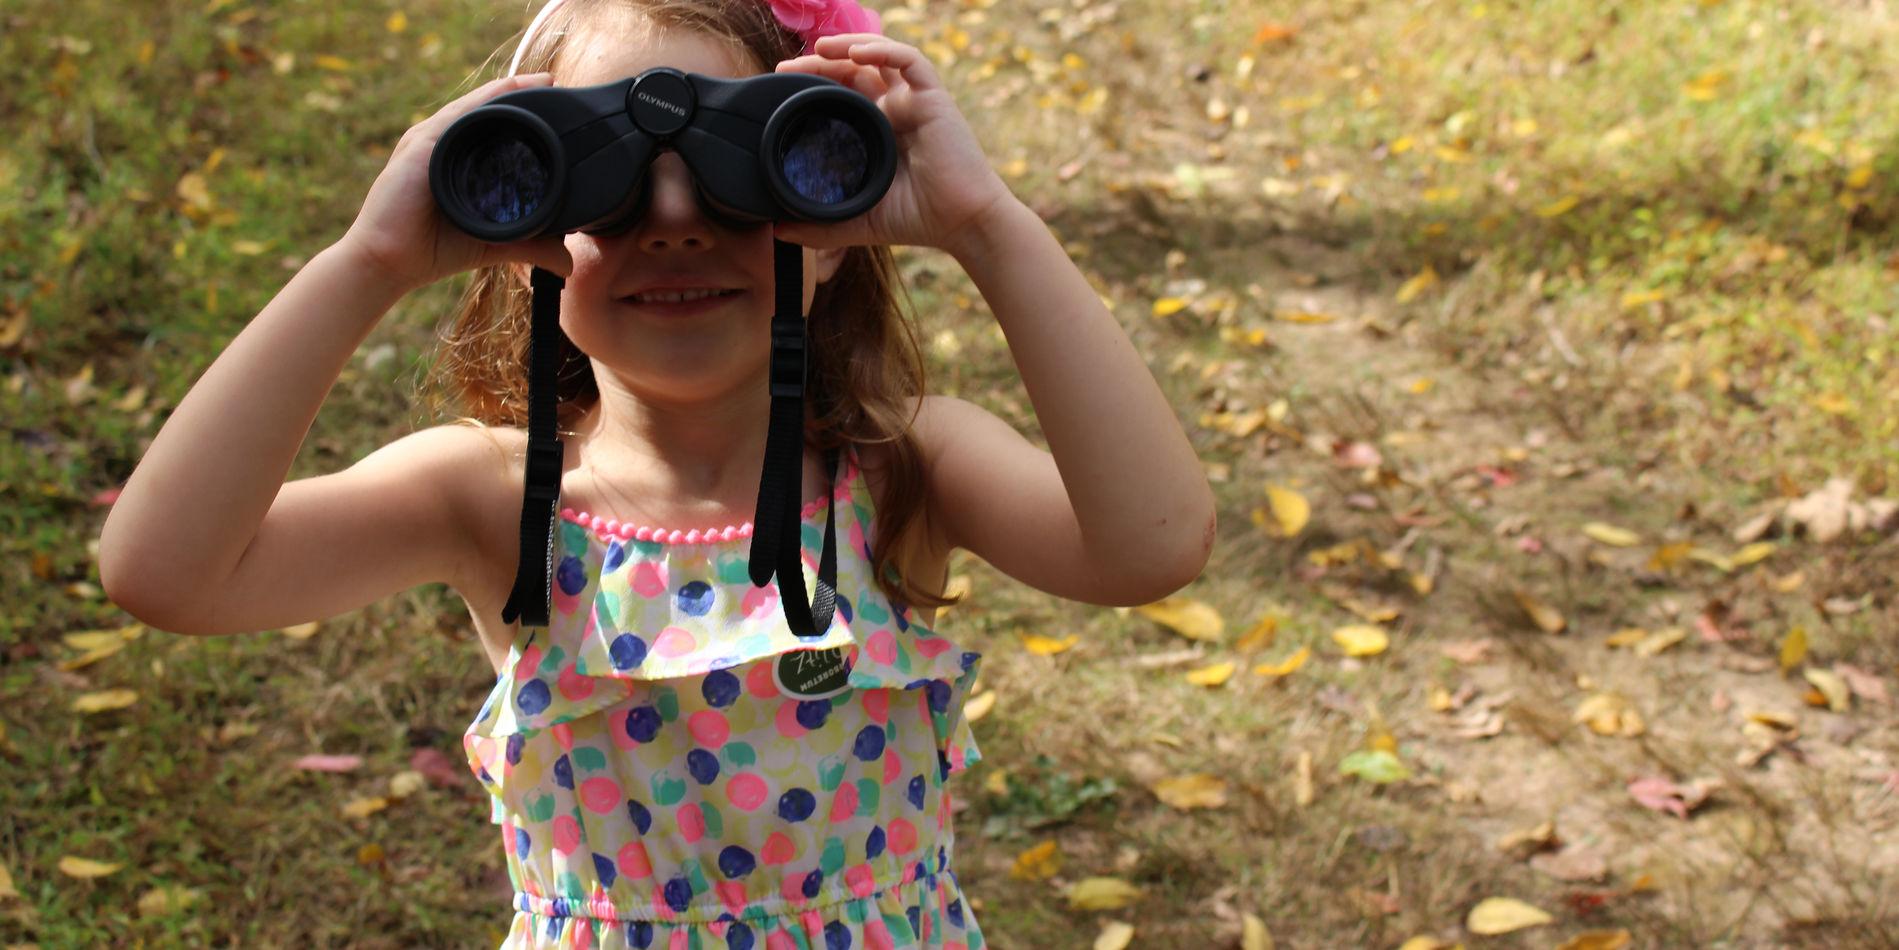 Using binoculars at BioBlitz